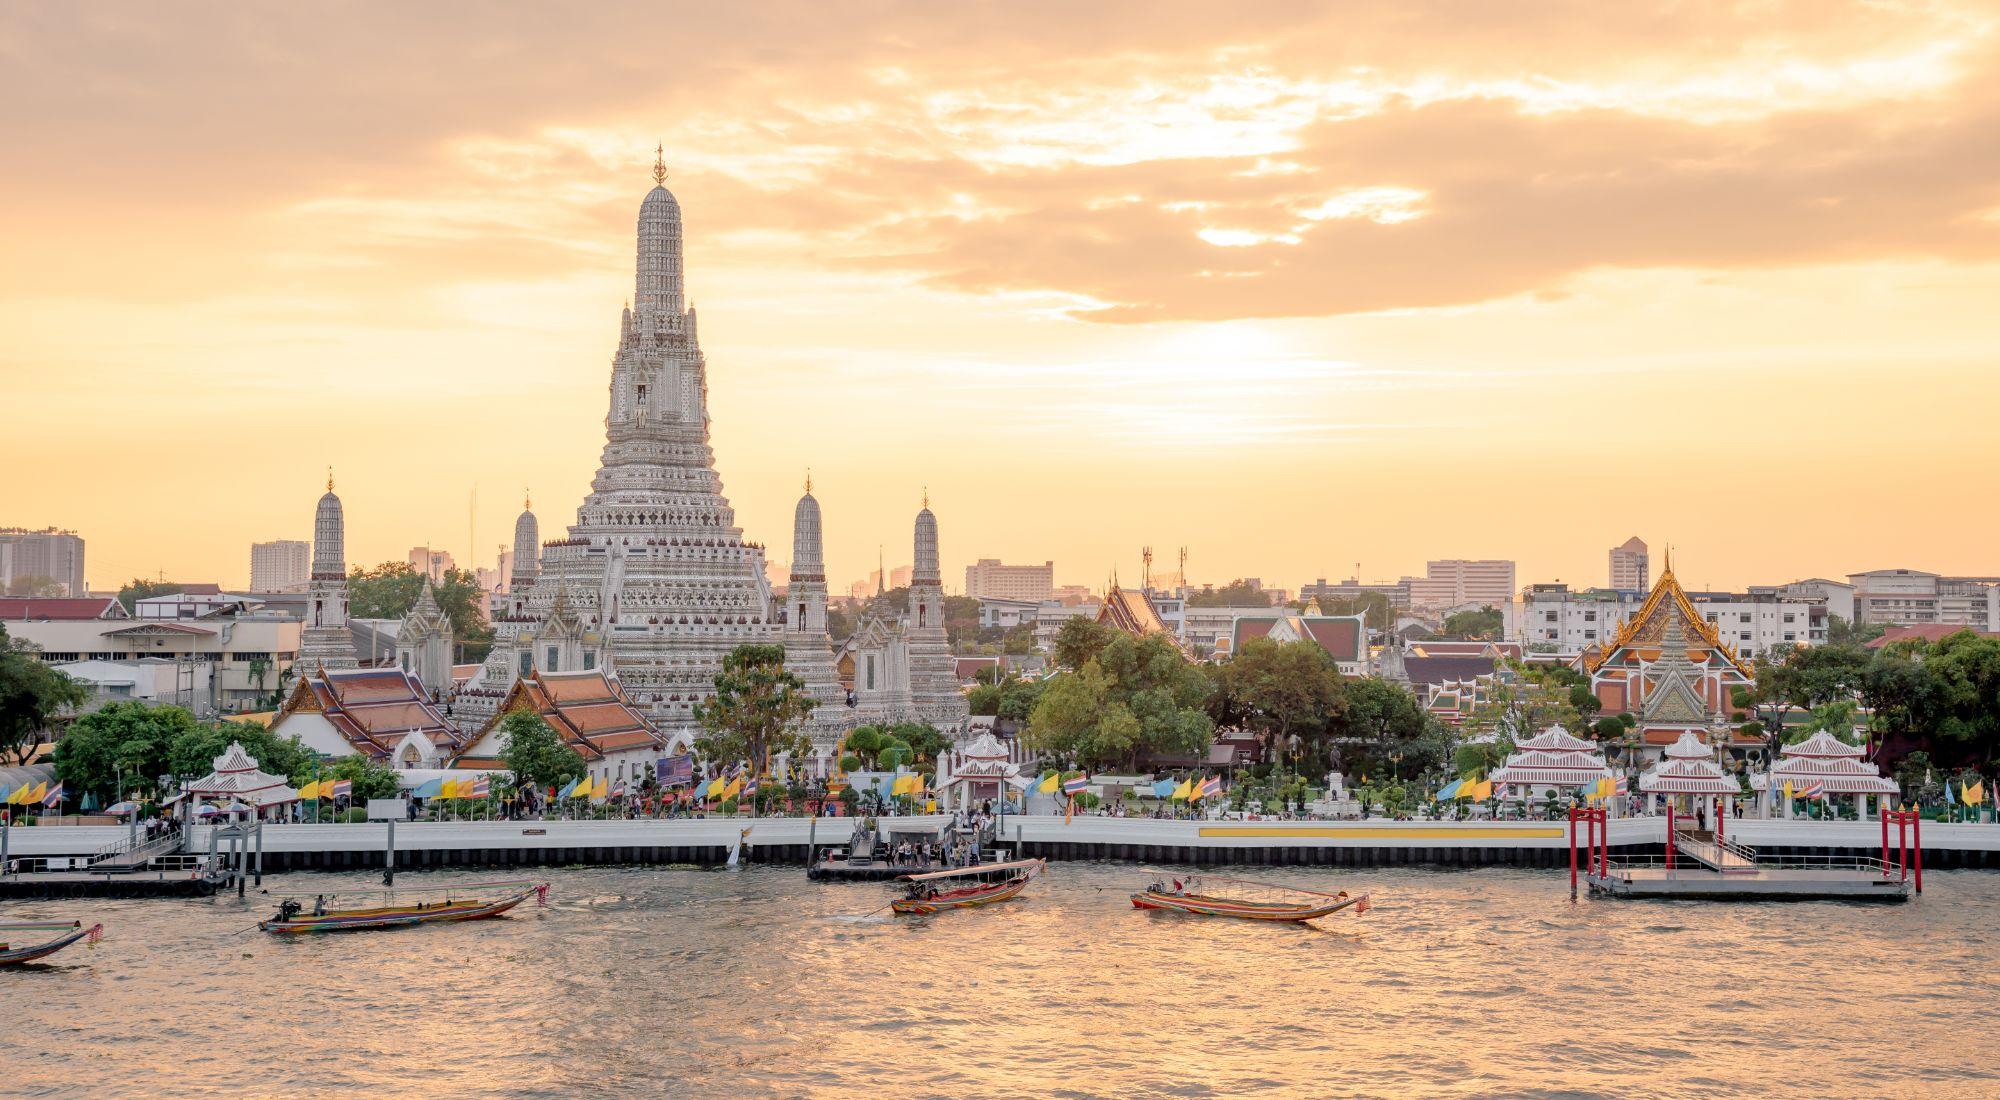 Thailand Bangkok Chao Phraya rivier uitzichtpunt op Wat Arun